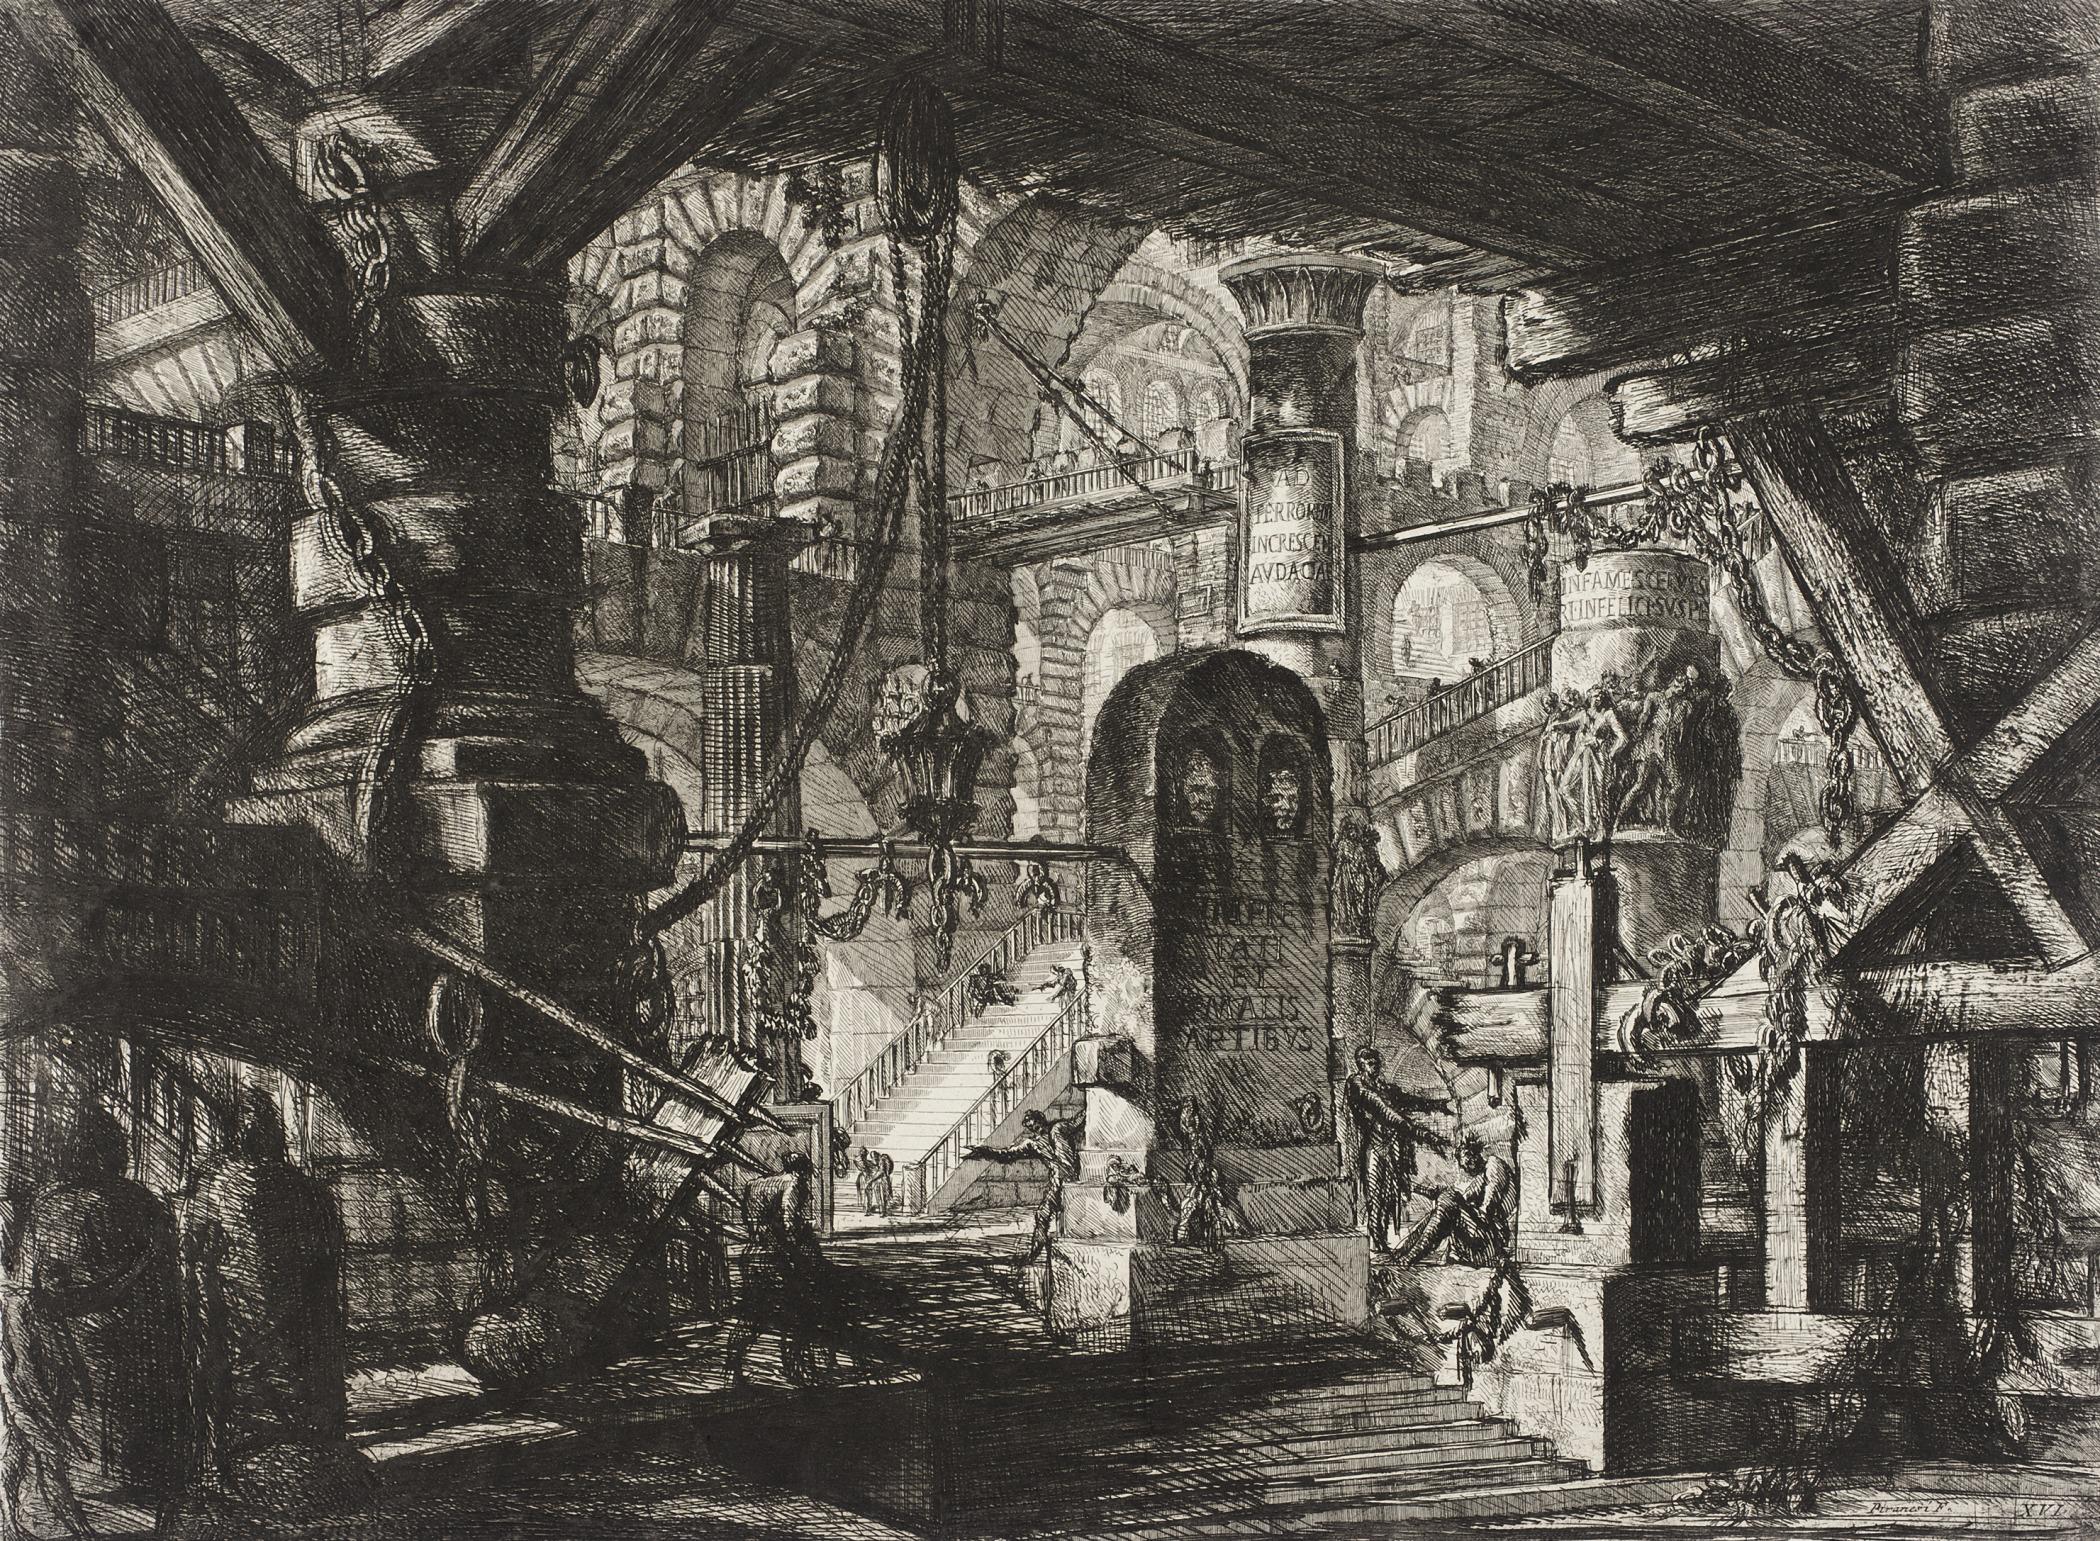 Piranesi- Carceri XVI-the Pier With Chains